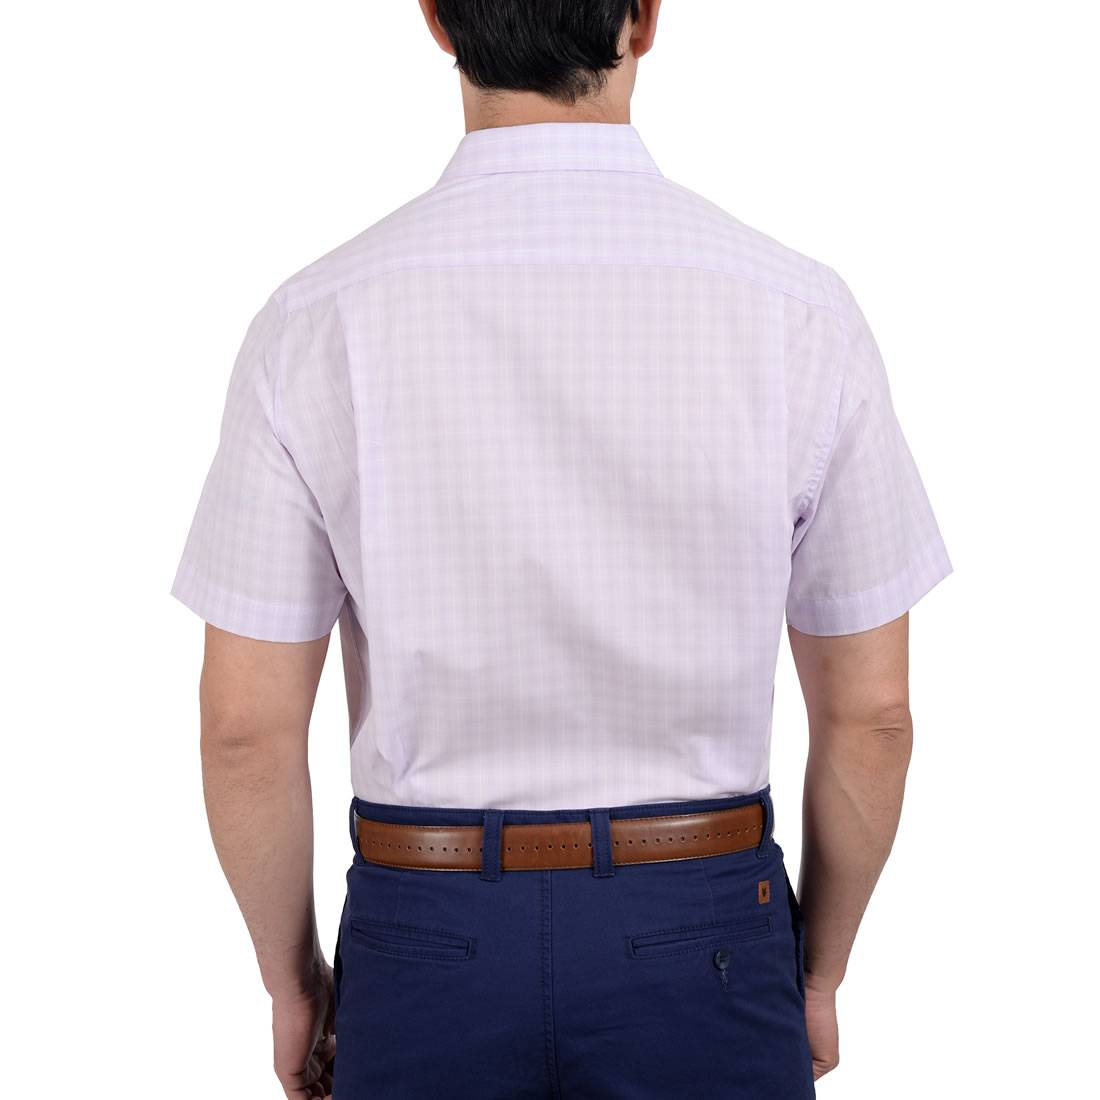 04C217432941-02-Camisa-Casual-Manga-Corta-Classic-Fit-Lila-yale